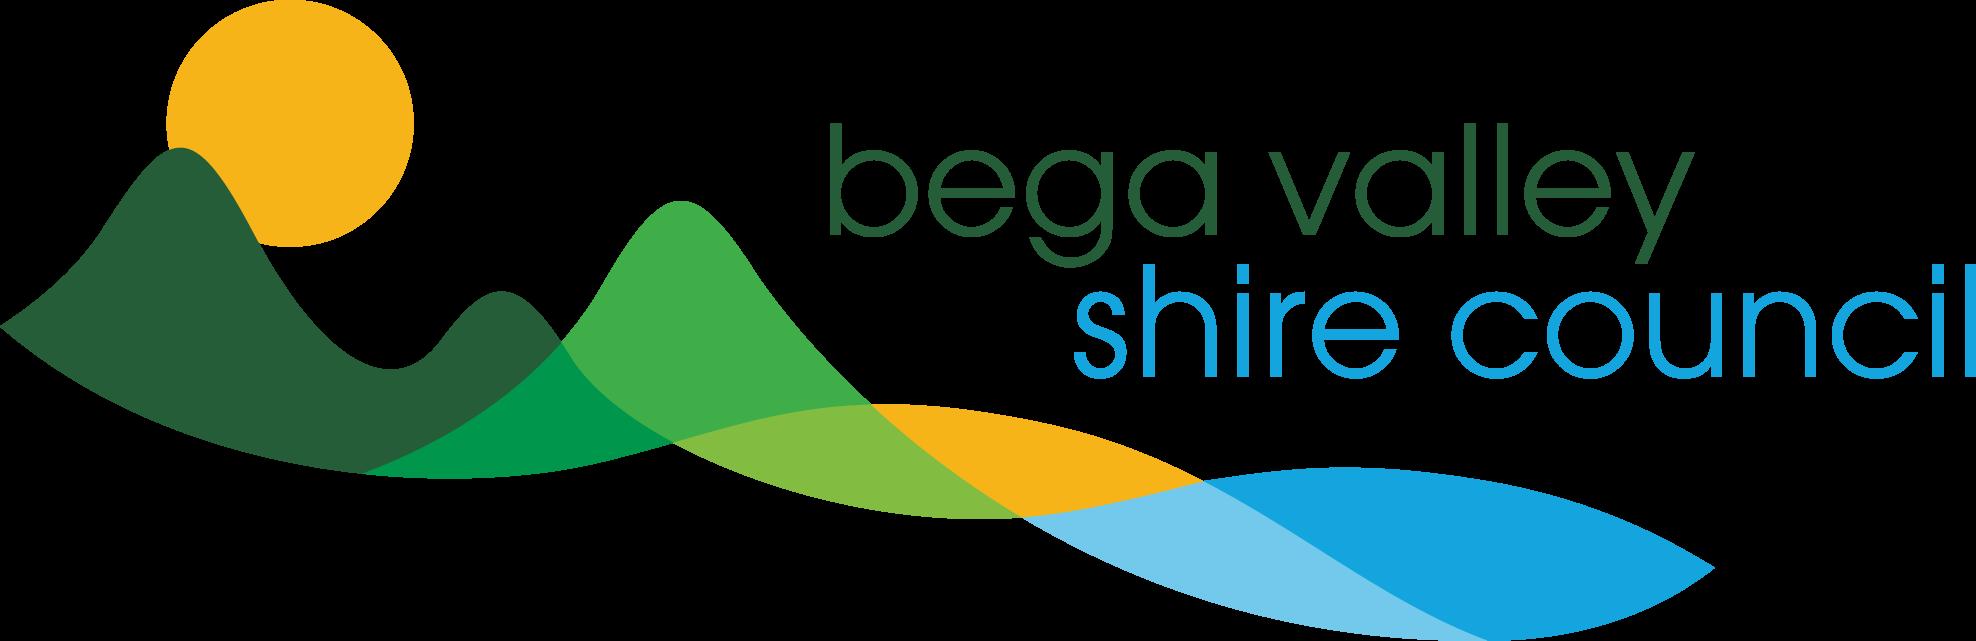 Bega VSC - Logo - Col - RGB.png